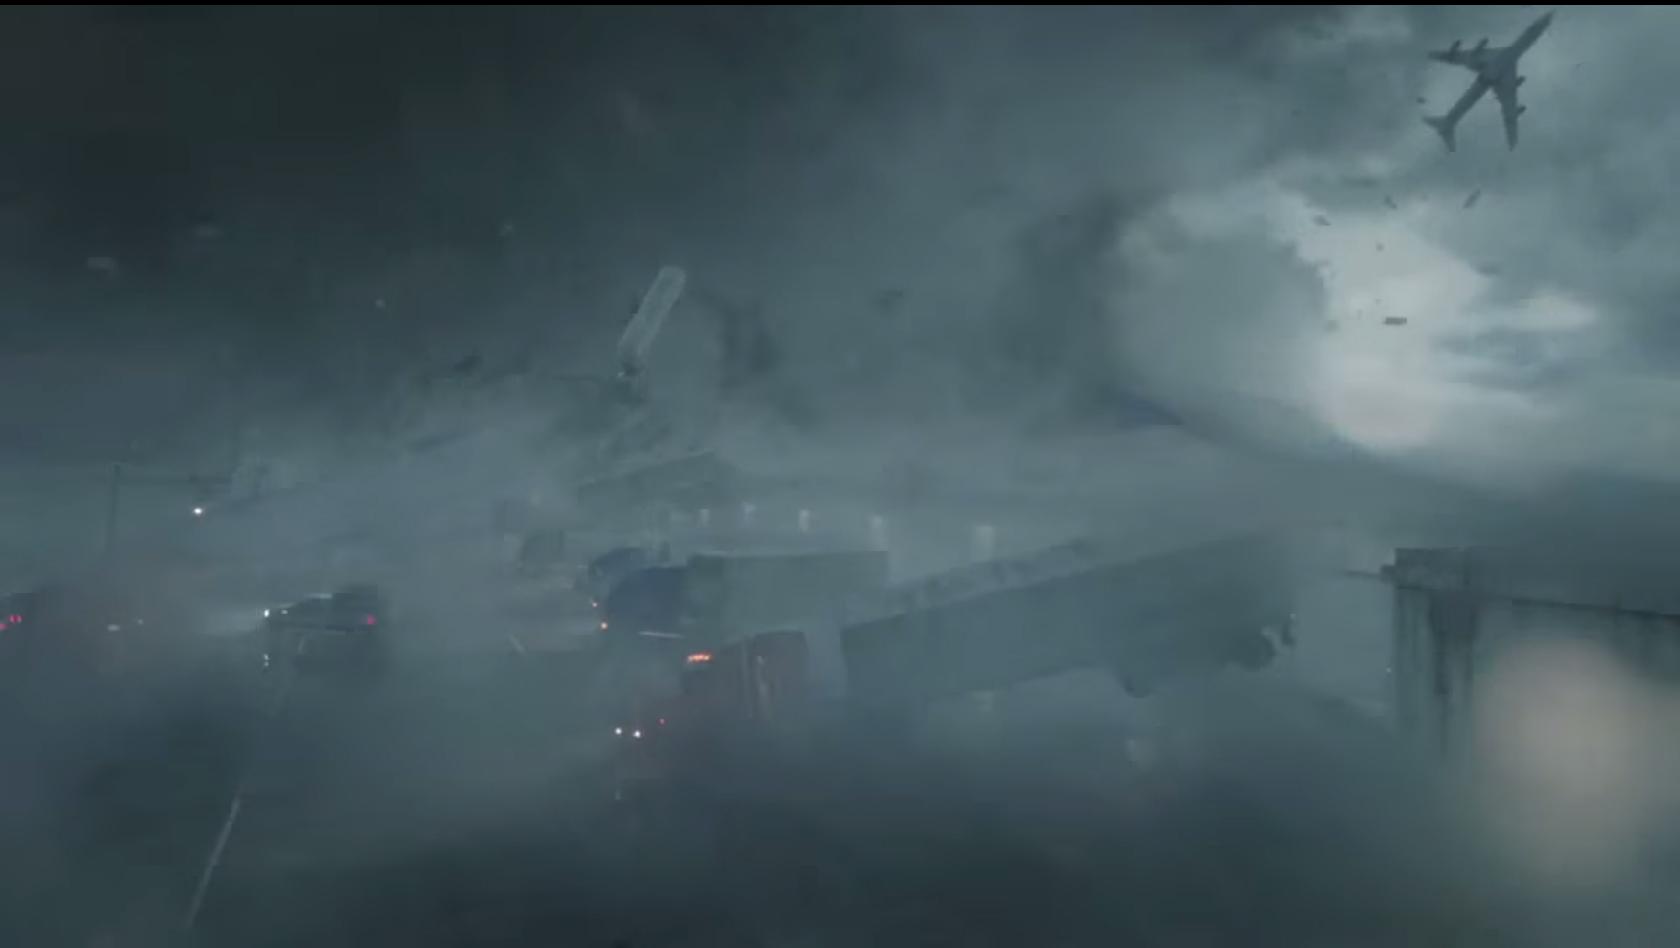 Into The Storm (Trailer #1) Review | Tim's Film Reviews